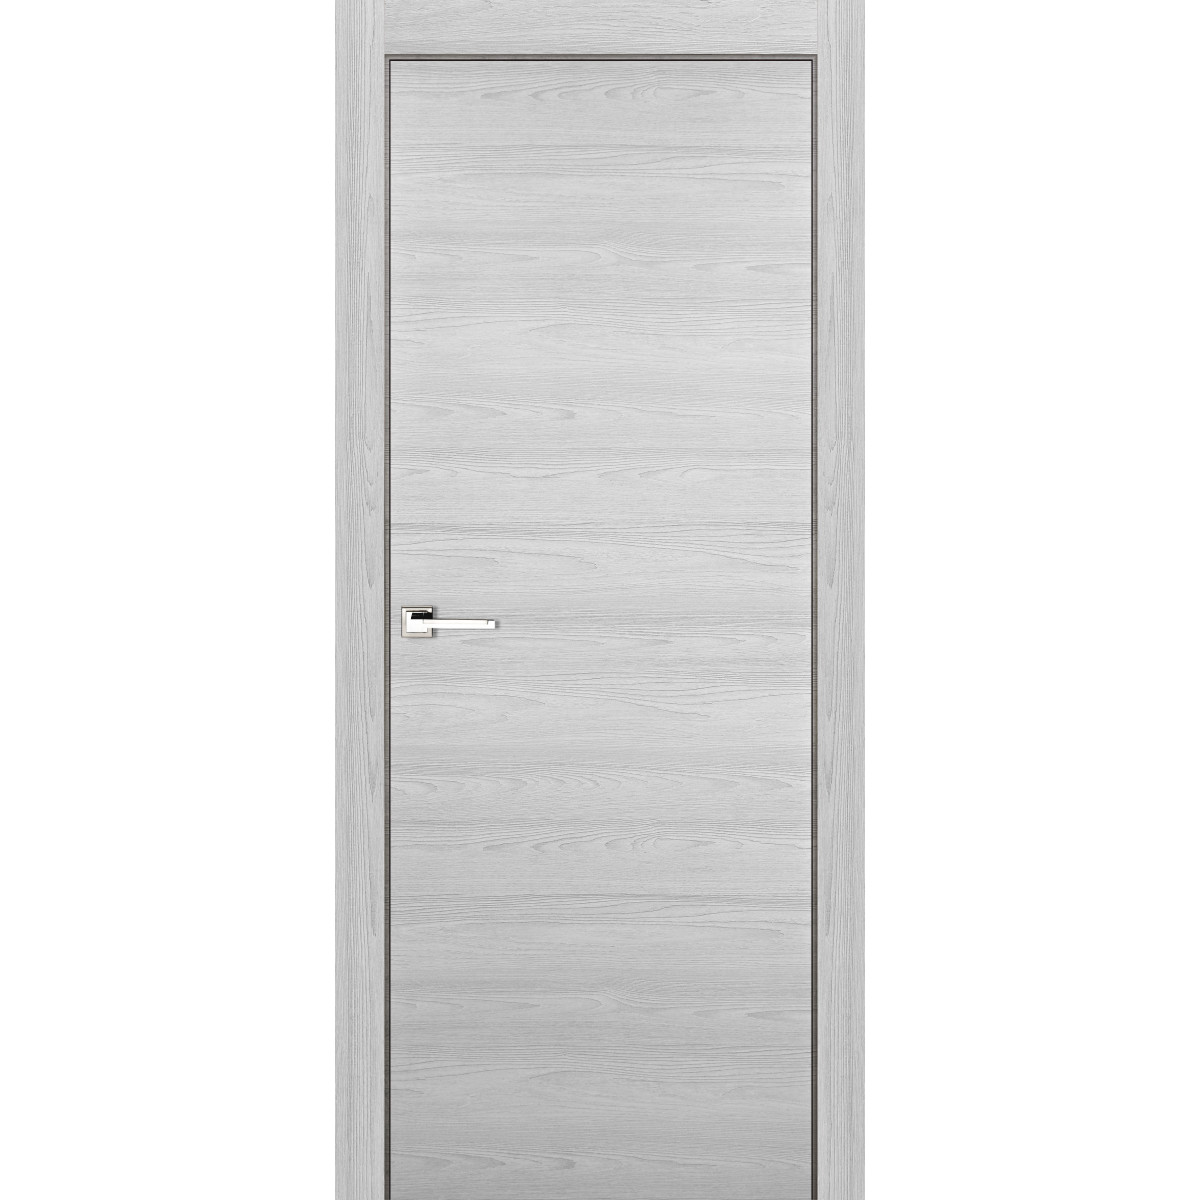 Дверь Межкомнатная Глухая 70x200 Ламинация Цвет Ясень Серый